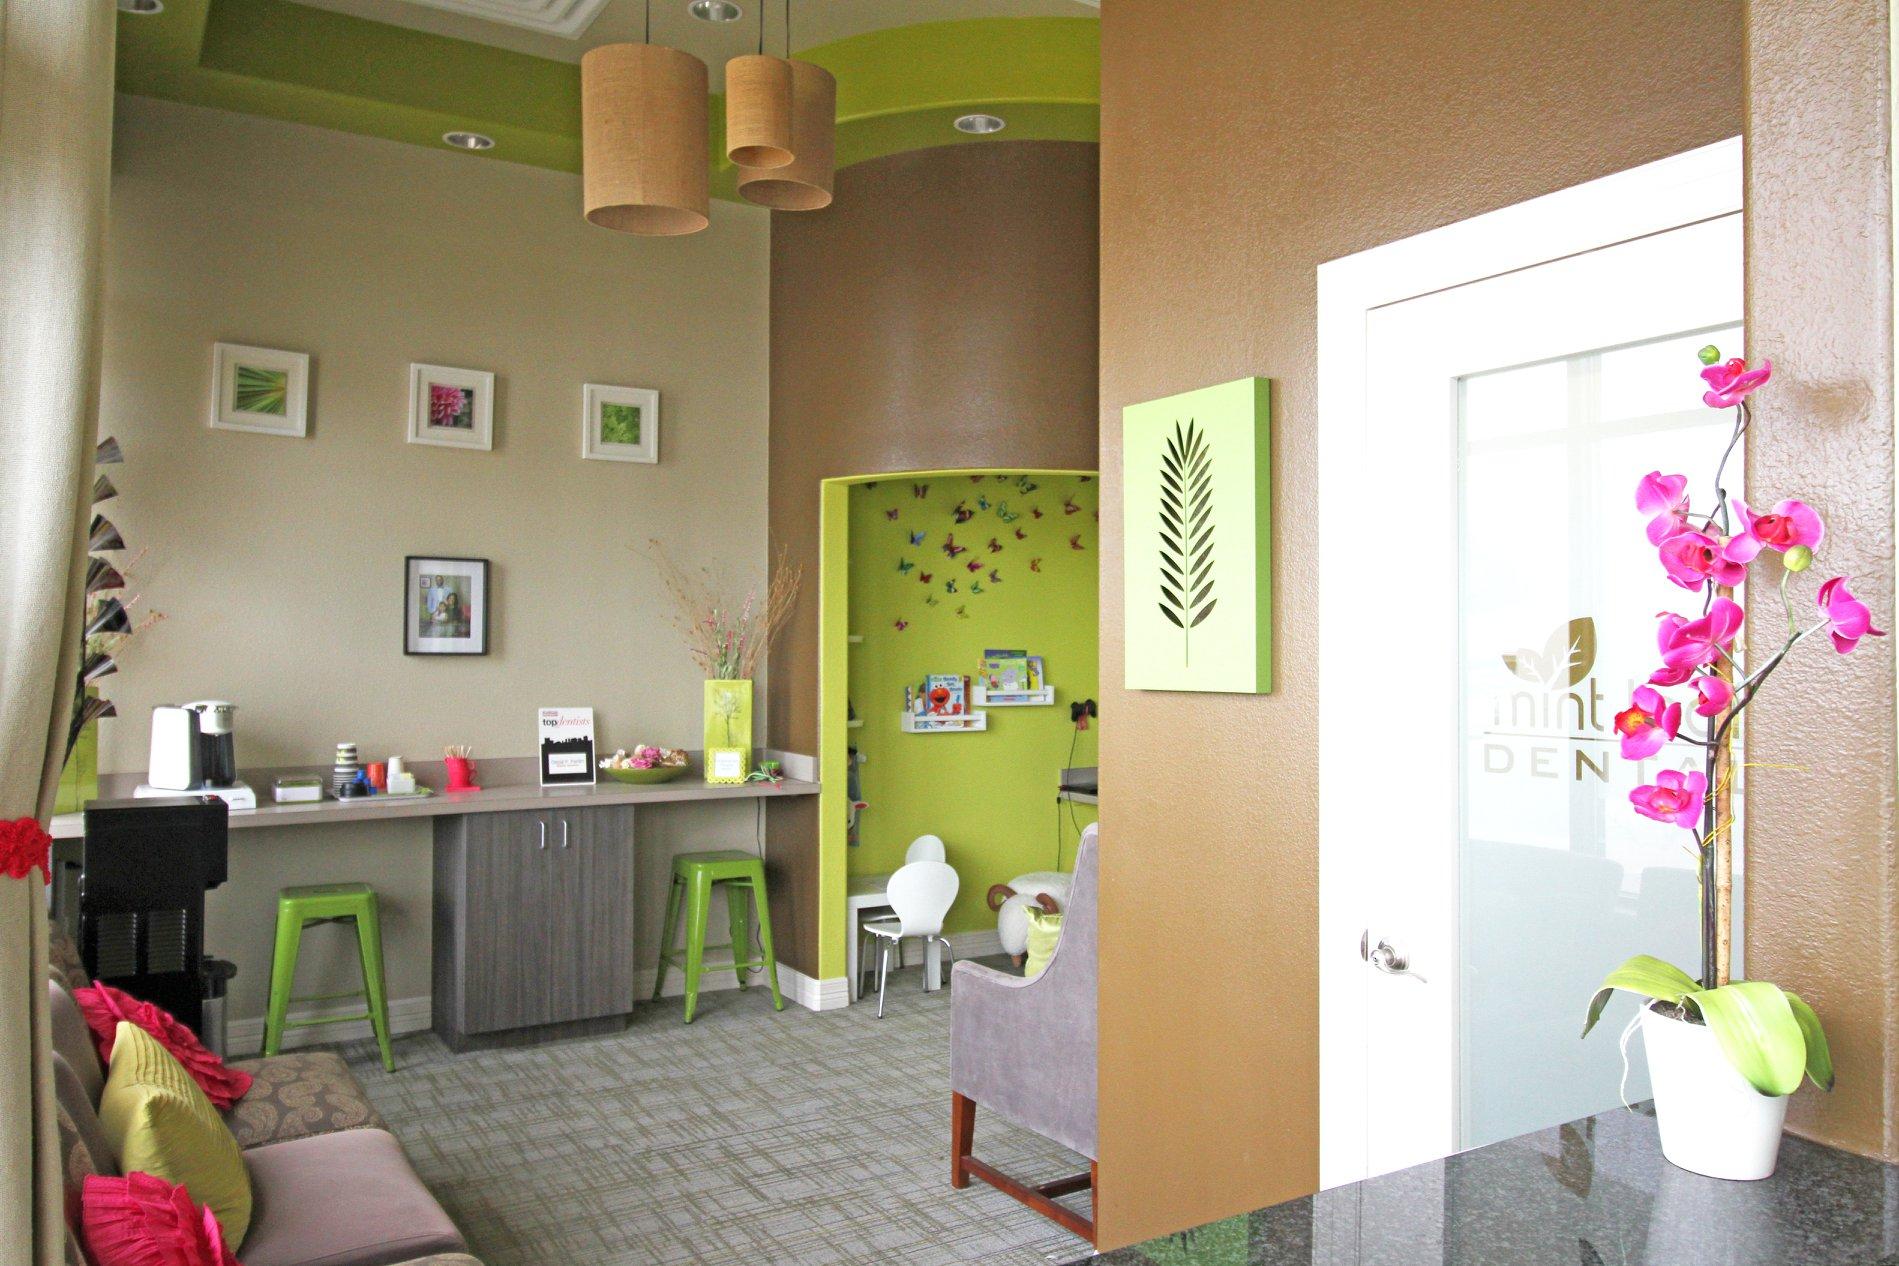 Mint Leaf Dental reviews | Dentists at 8544 S Hulen St - Fort Worth TX